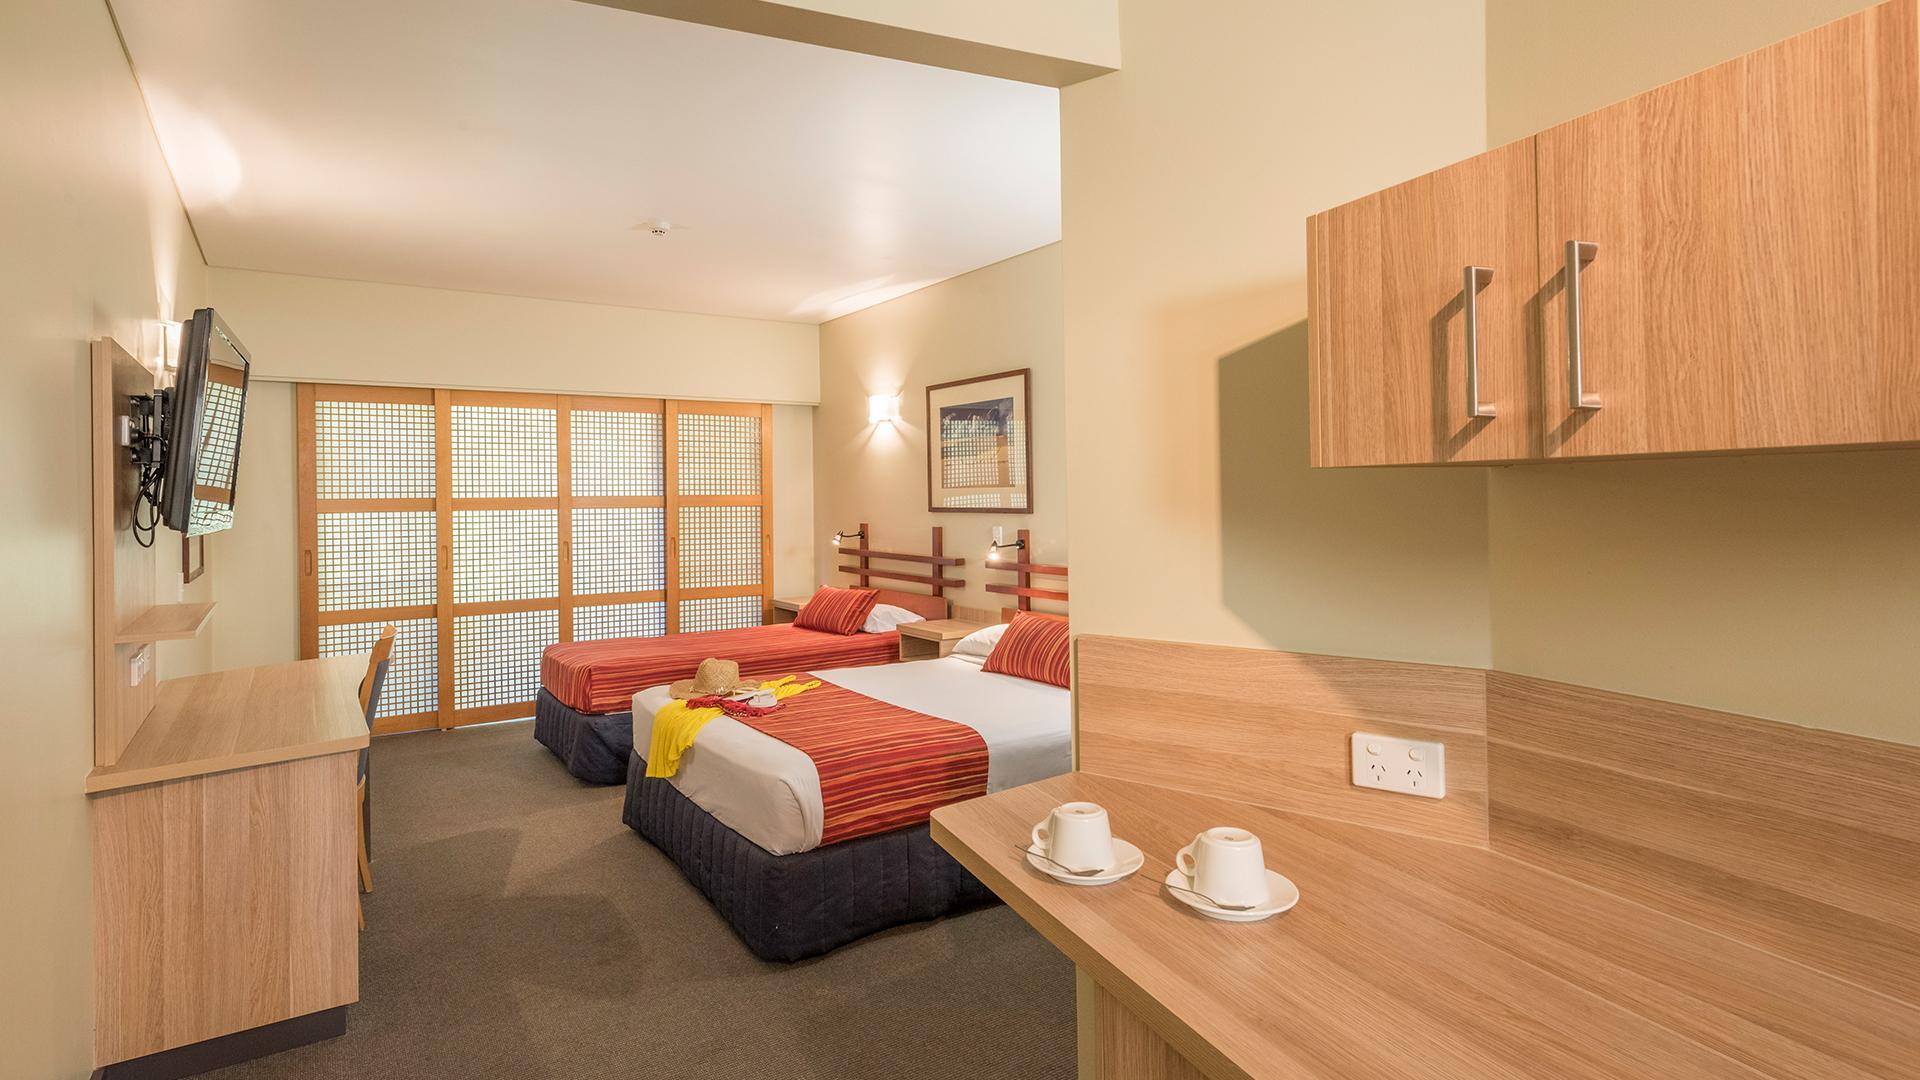 Resort Hotel Room - 3 Nights - FRASER ISLAND EXPERIENCE image 1 at Kingfisher Bay Resort by Fraser Coast Regional, Queensland, Australia